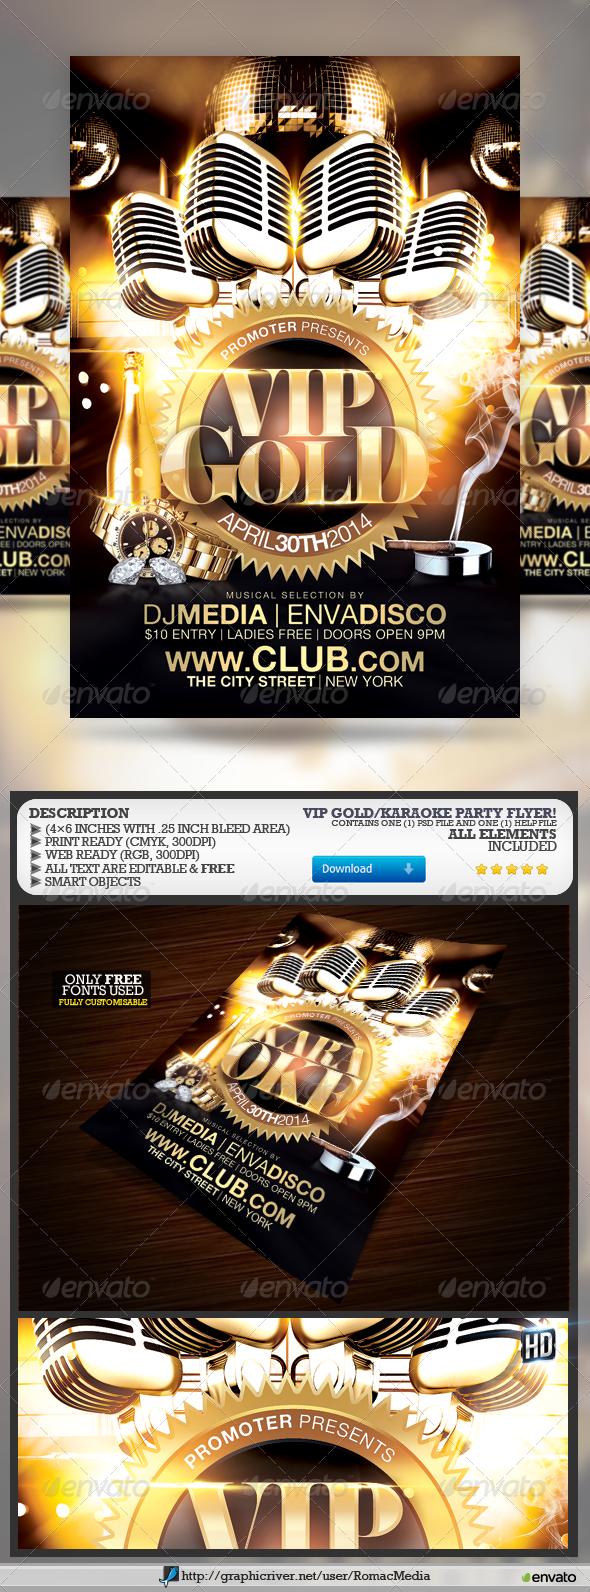 VIP Gold Karaoke Party